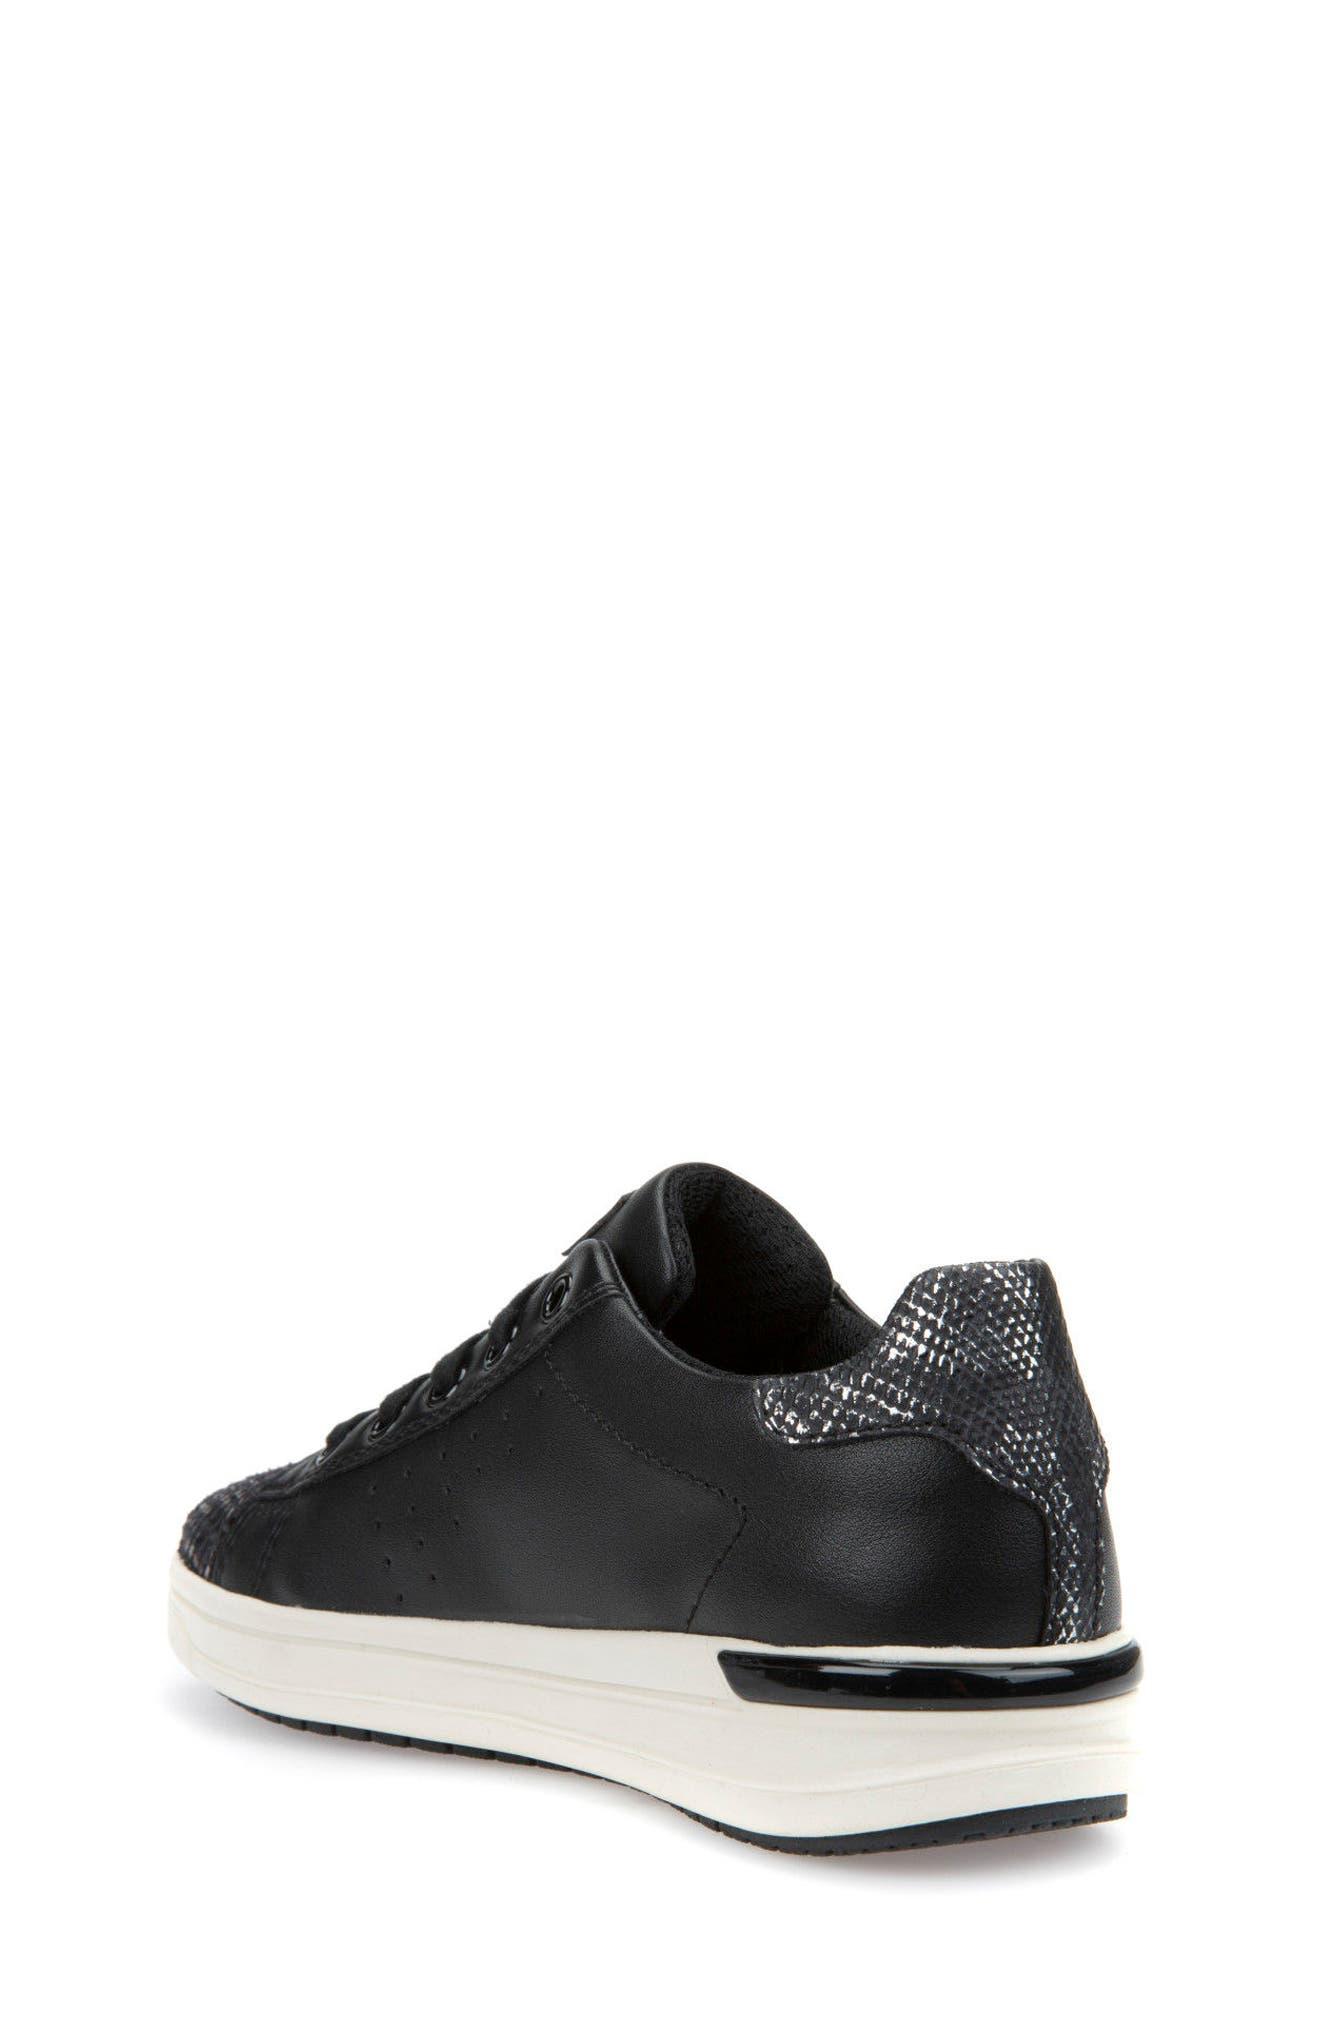 Cave Up Girl Low Top Sneaker,                             Alternate thumbnail 2, color,                             Black